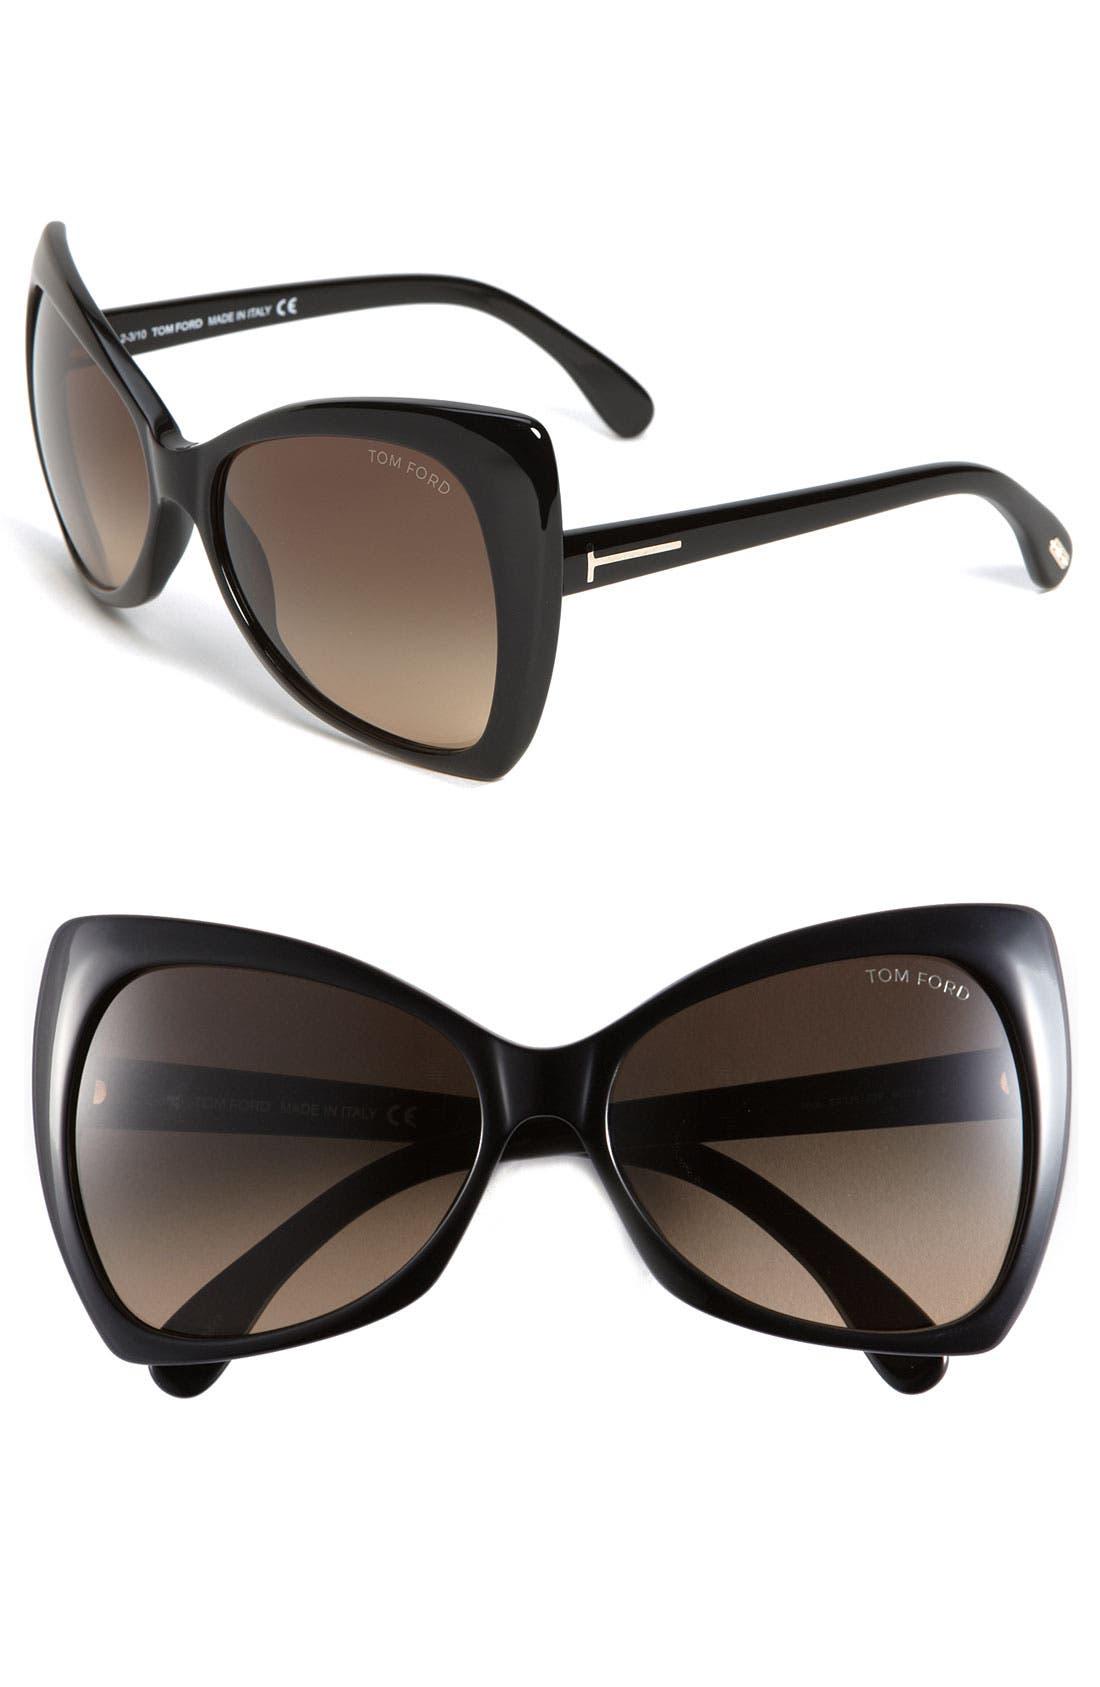 Alternate Image 1 Selected - Tom Ford 'Nico' Retro Inspired Frame Sunglasses